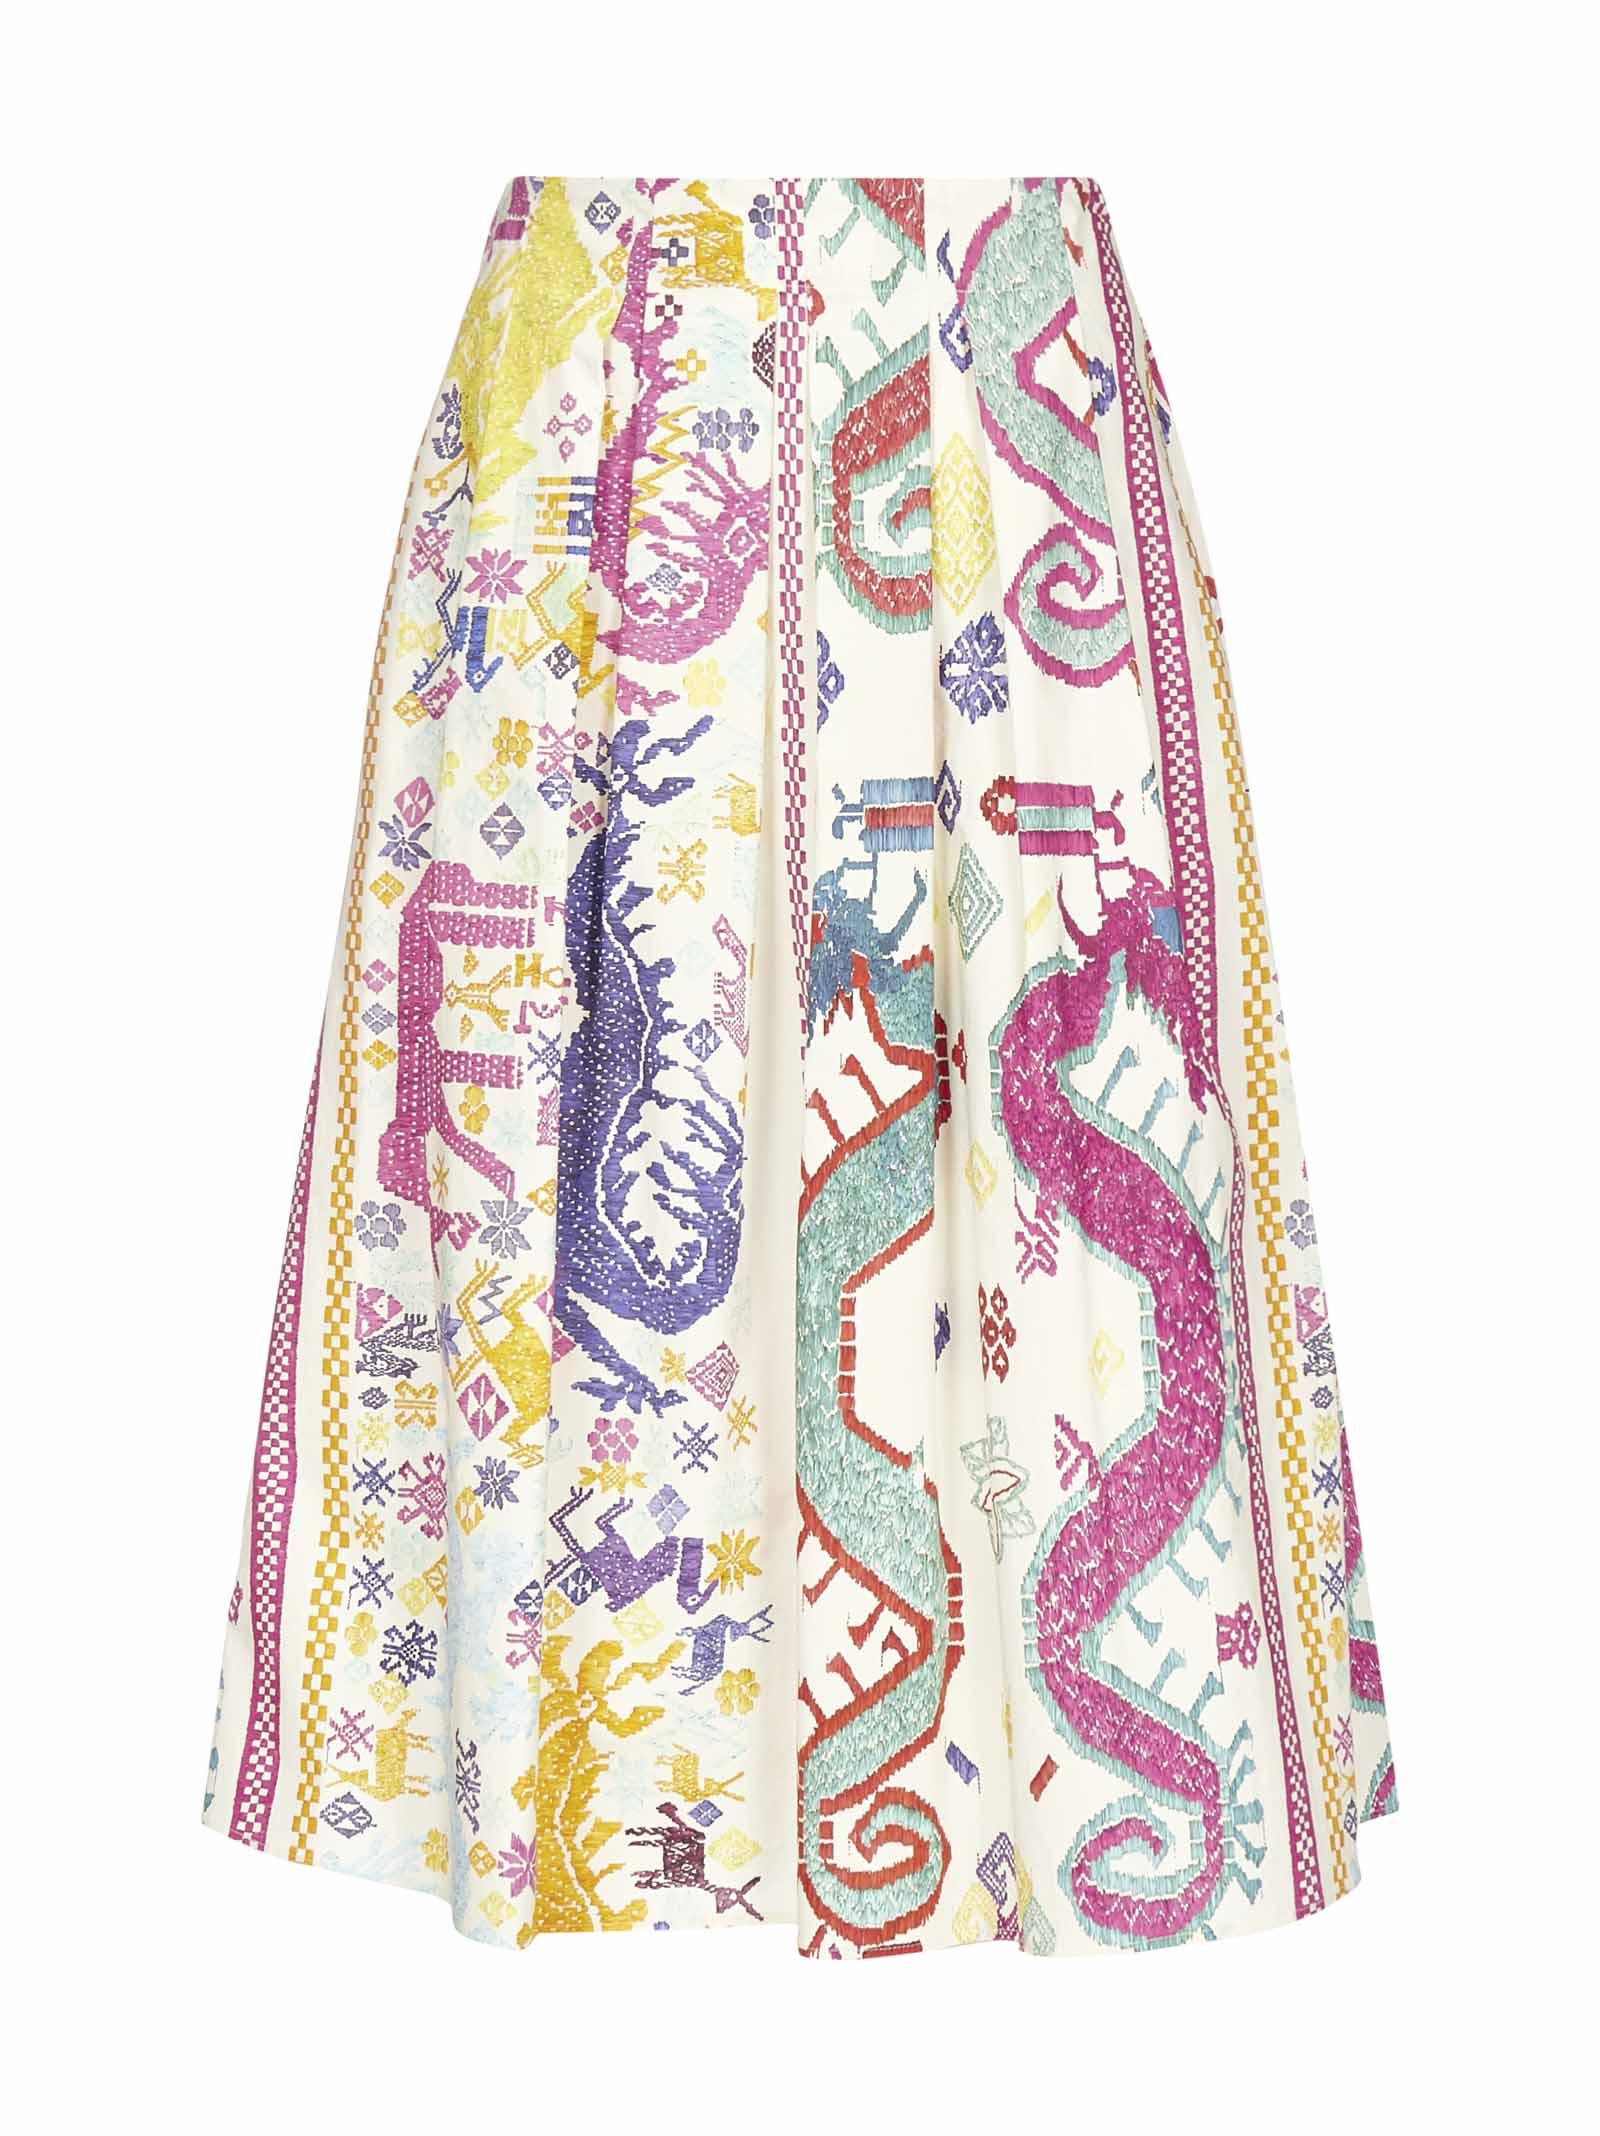 Etro Lampedusa Ethnic Print Cotton Skirt